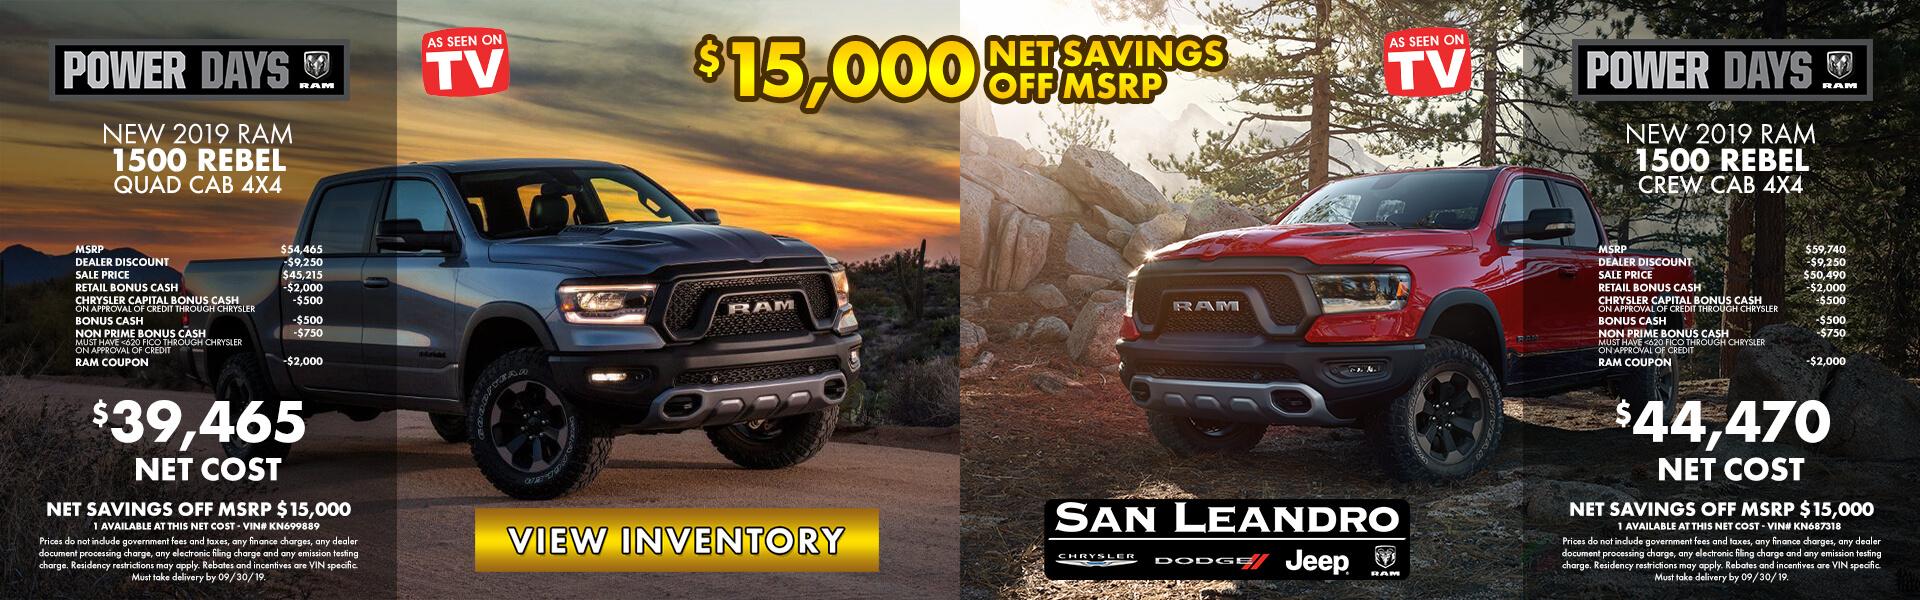 San Leandro Dodge Dealer >> 47 New Ram 1500 in Stock in San Francisco, Oakland ...